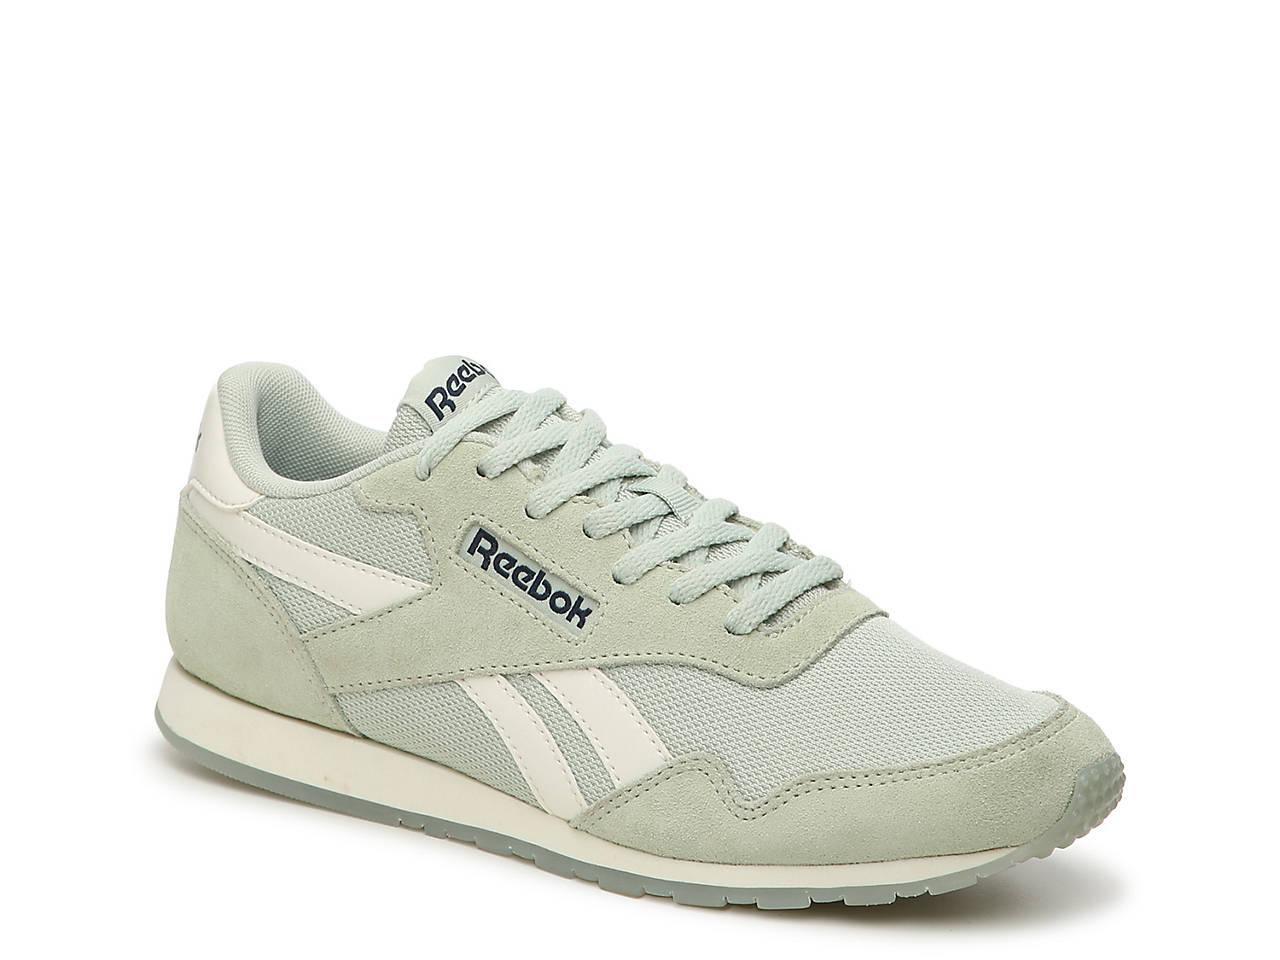 49928dbe8cb Reebok Classic Sneaker - Women s Women s Shoes